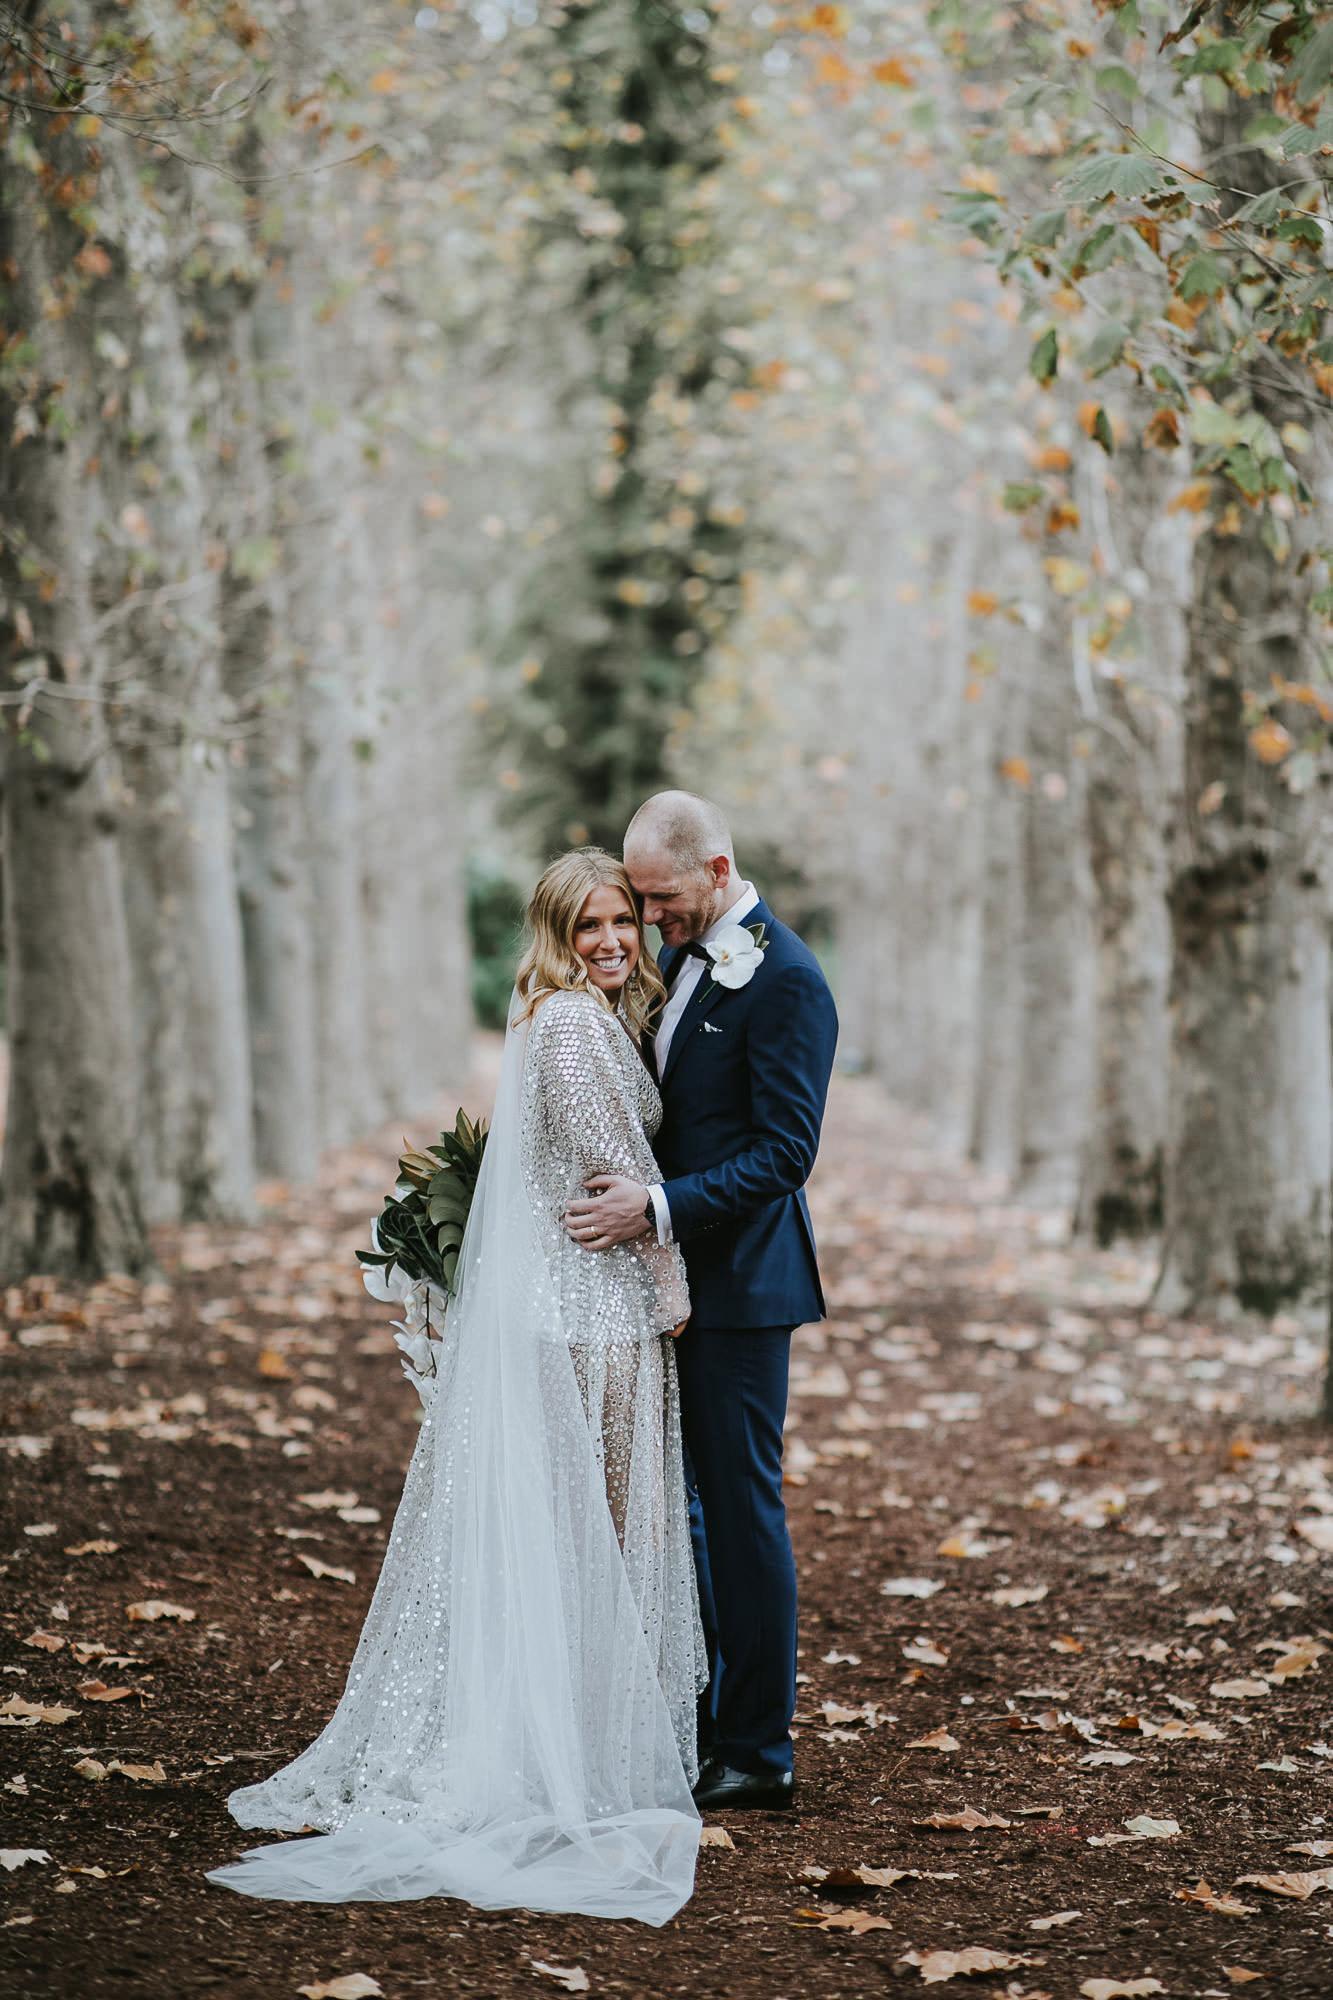 This Day Forward, Sydney Wedding Photographer, boho forrest, one day bridal